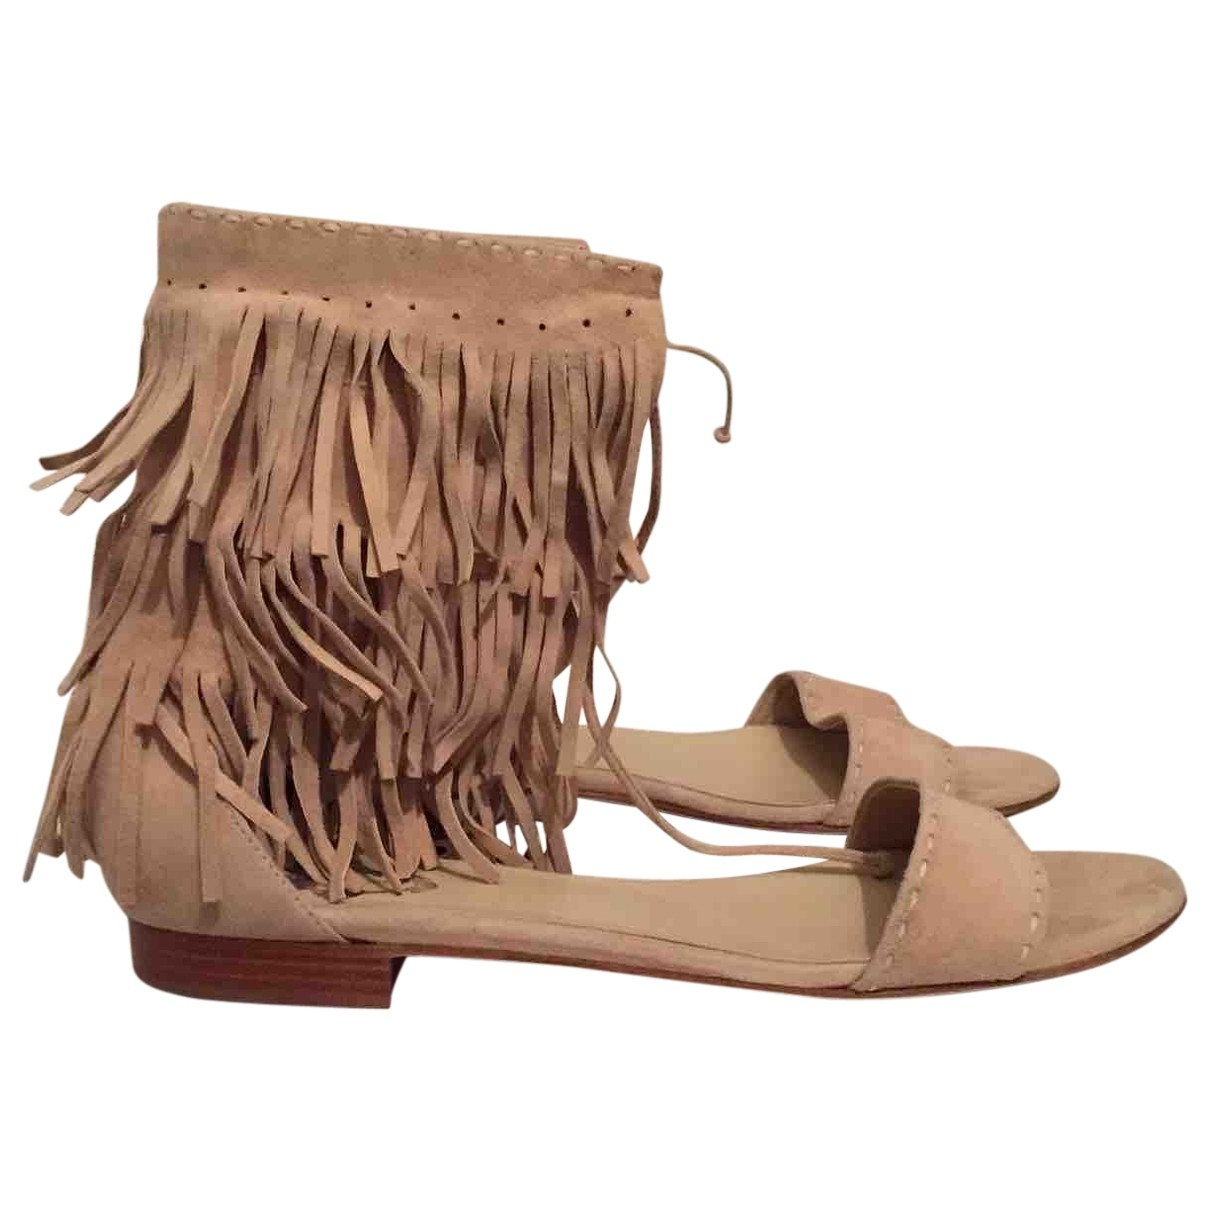 Paul & Joe \N Camel Suede Sandals for Women 39 EU